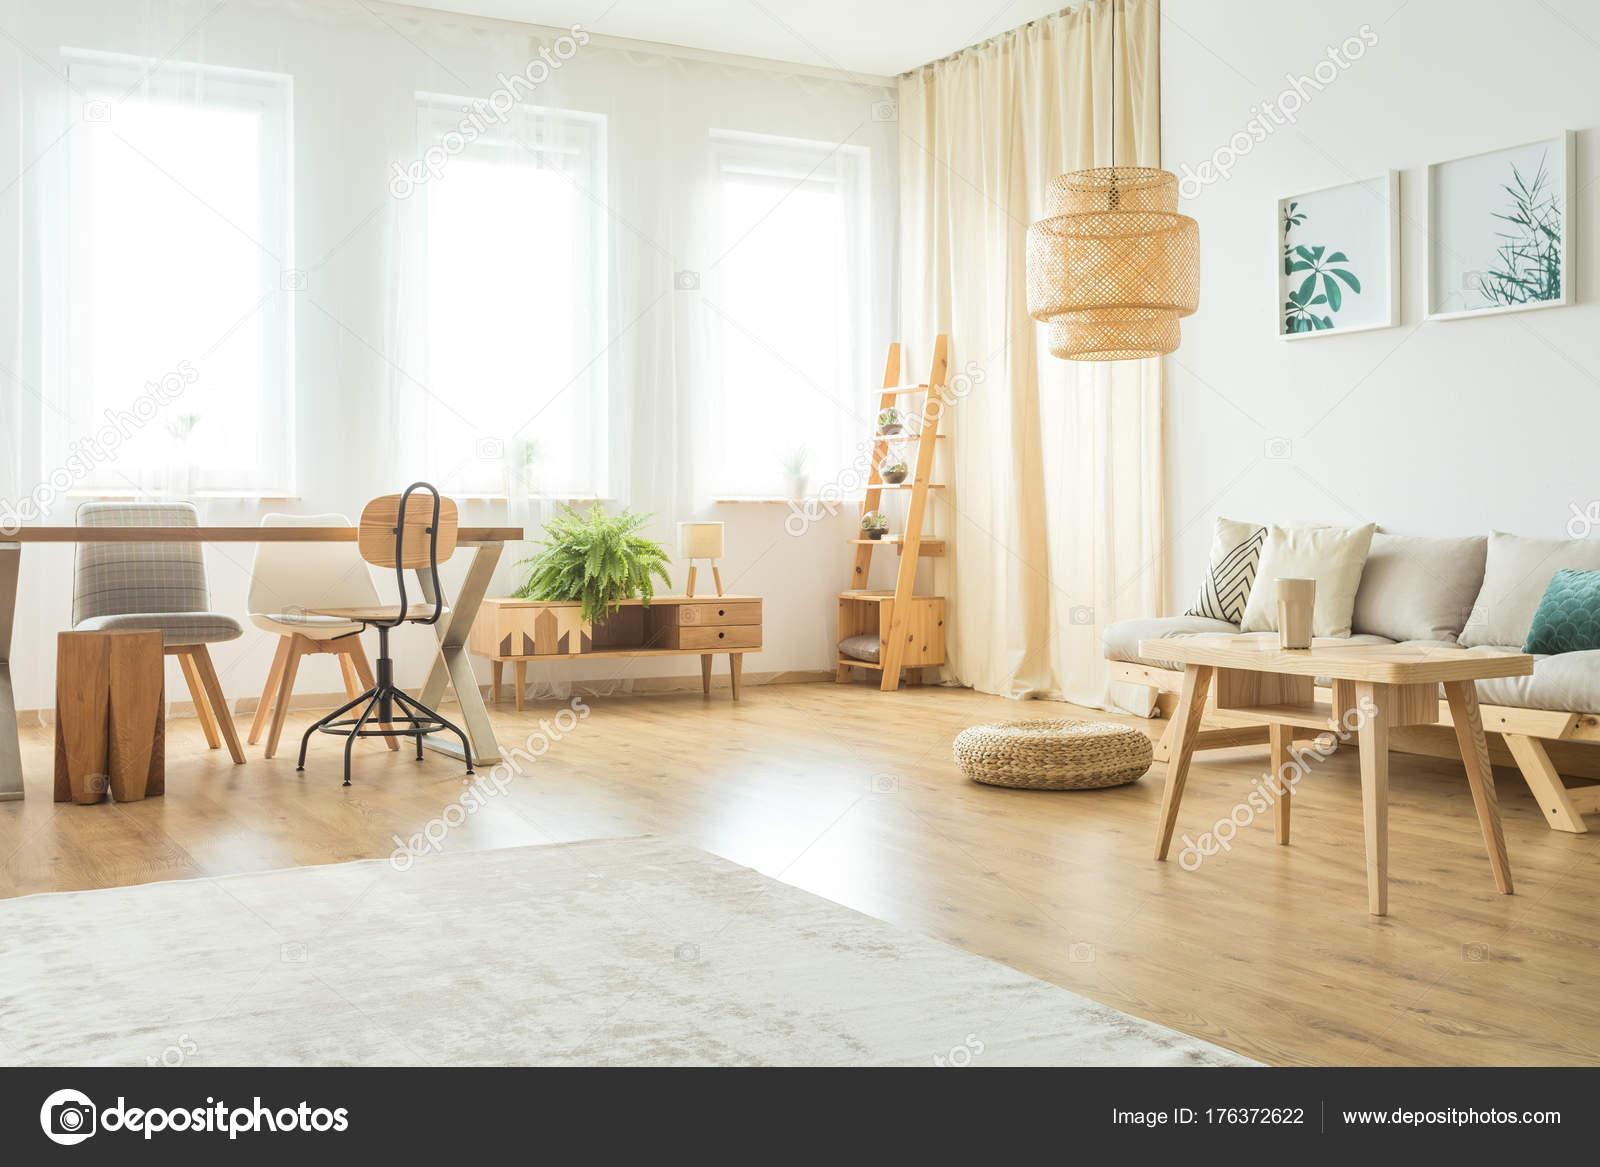 Eetkamer met rustieke meubels u2014 stockfoto © photographee.eu #176372622